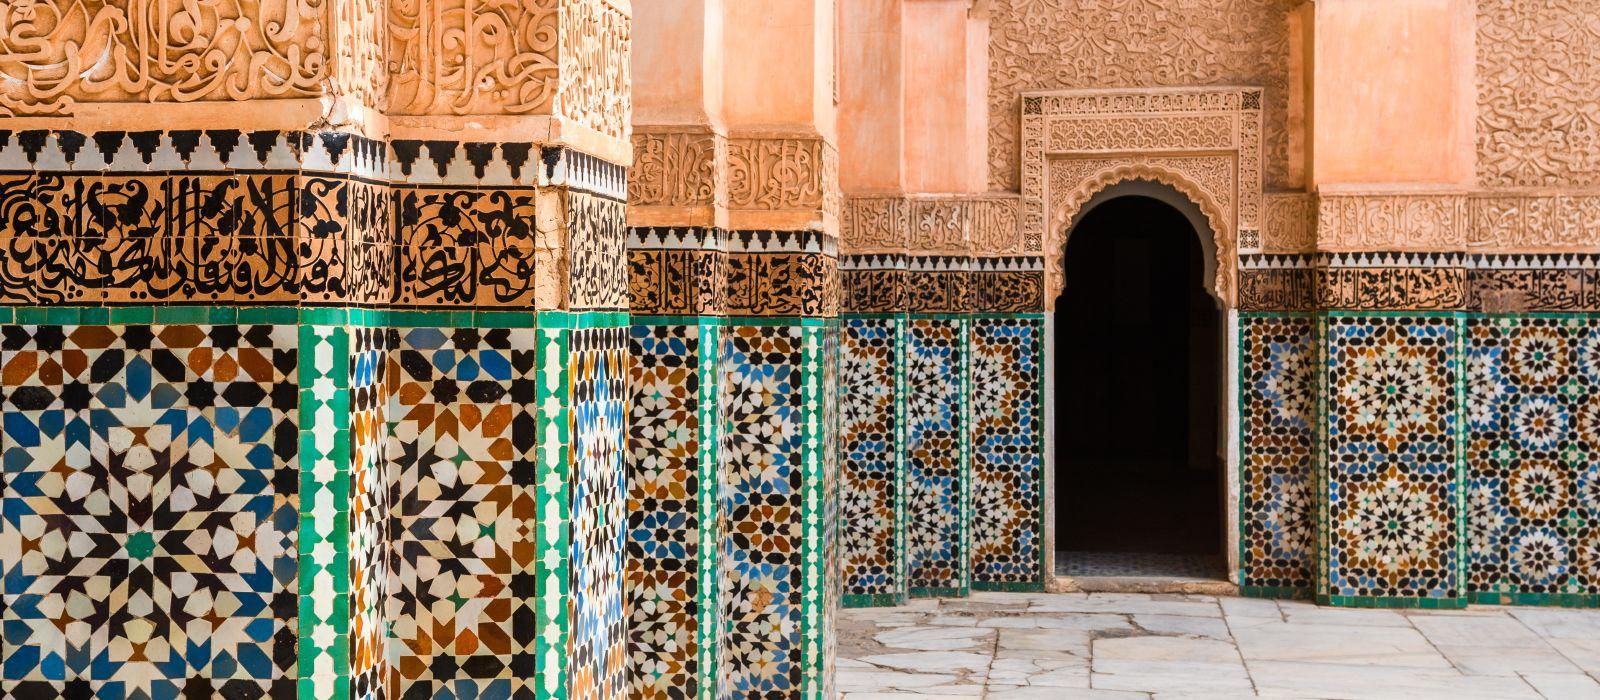 Hotel Riad Kniza Morocco